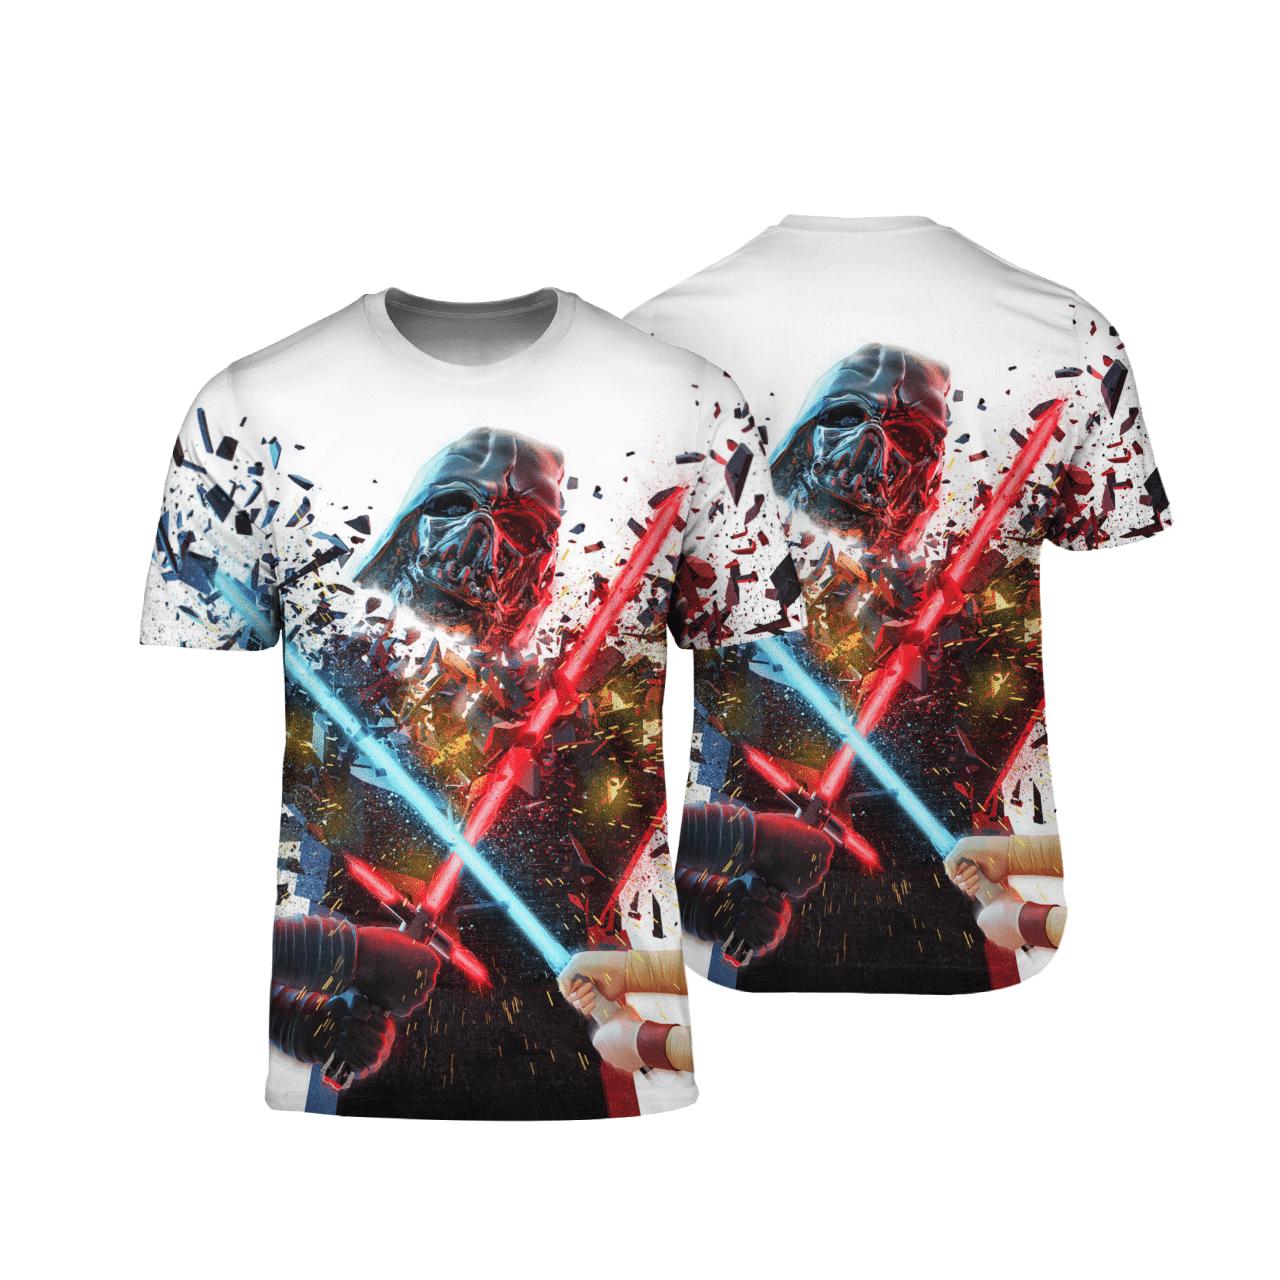 Darth Vader In End 3D Print T-shirt